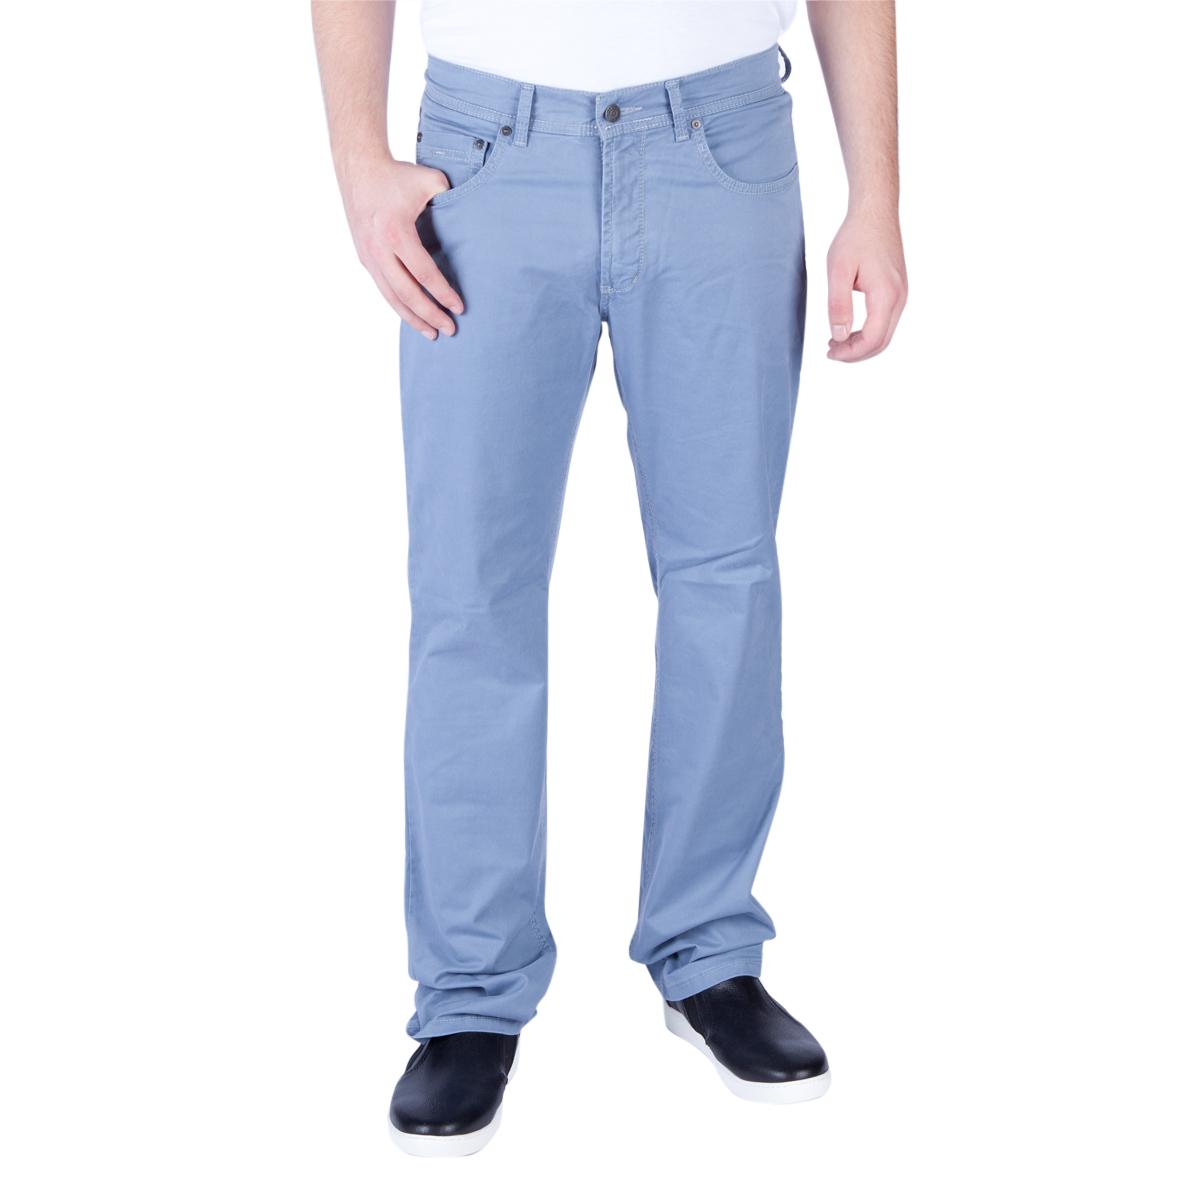 pioneer jeans herren hose chino flat div farben mod w 30 50 l 30 38 ebay. Black Bedroom Furniture Sets. Home Design Ideas